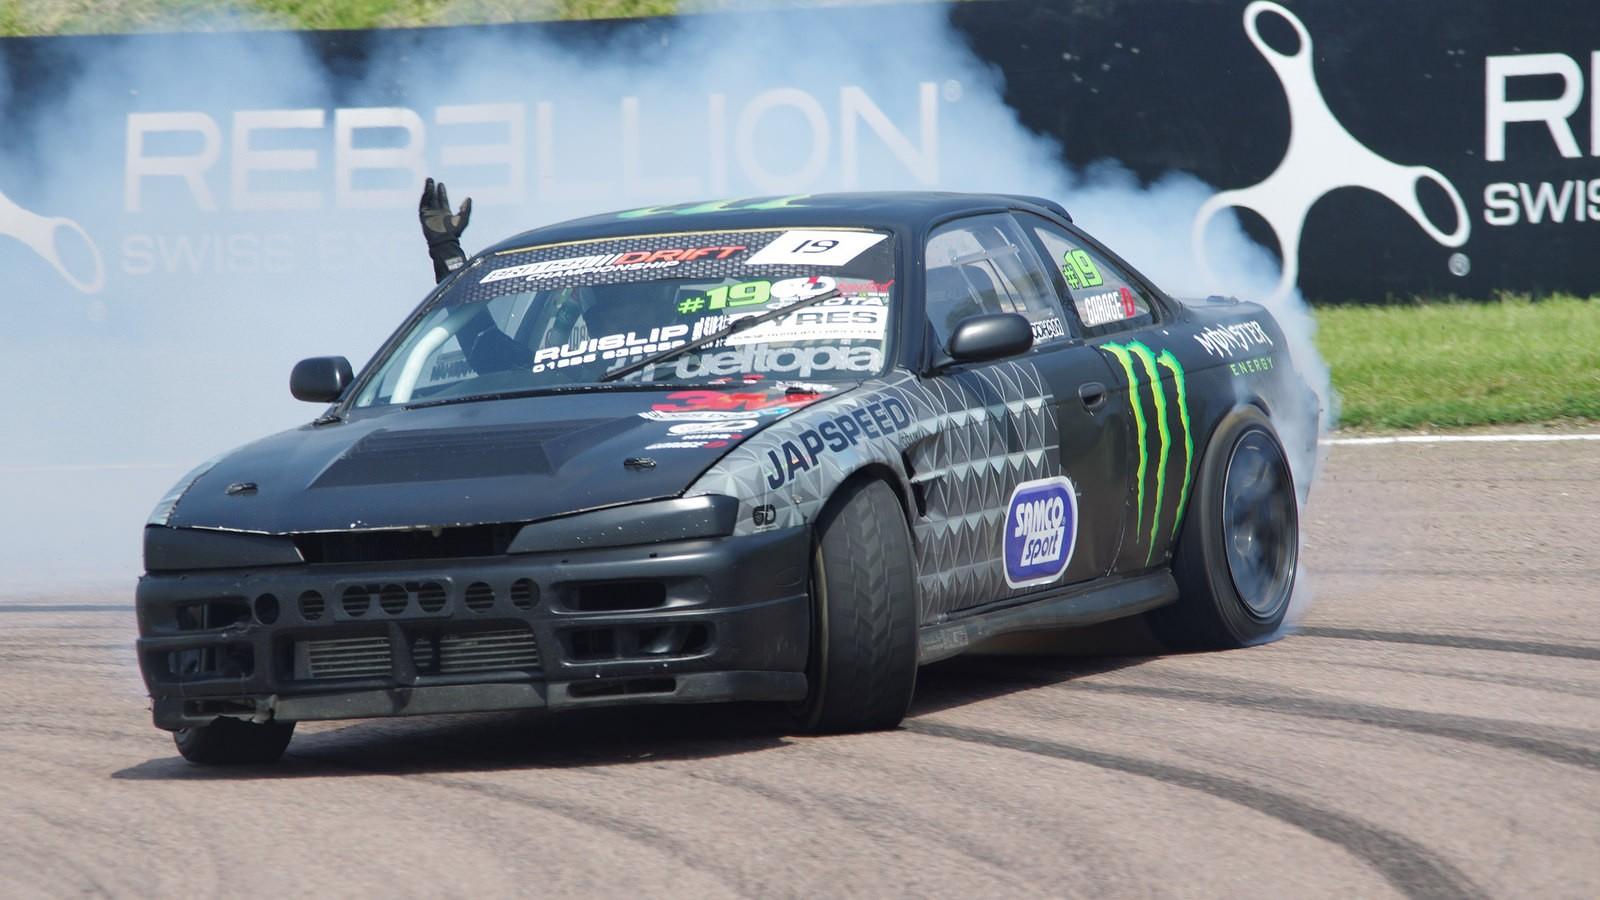 Nissan S200sx S14 Drifting